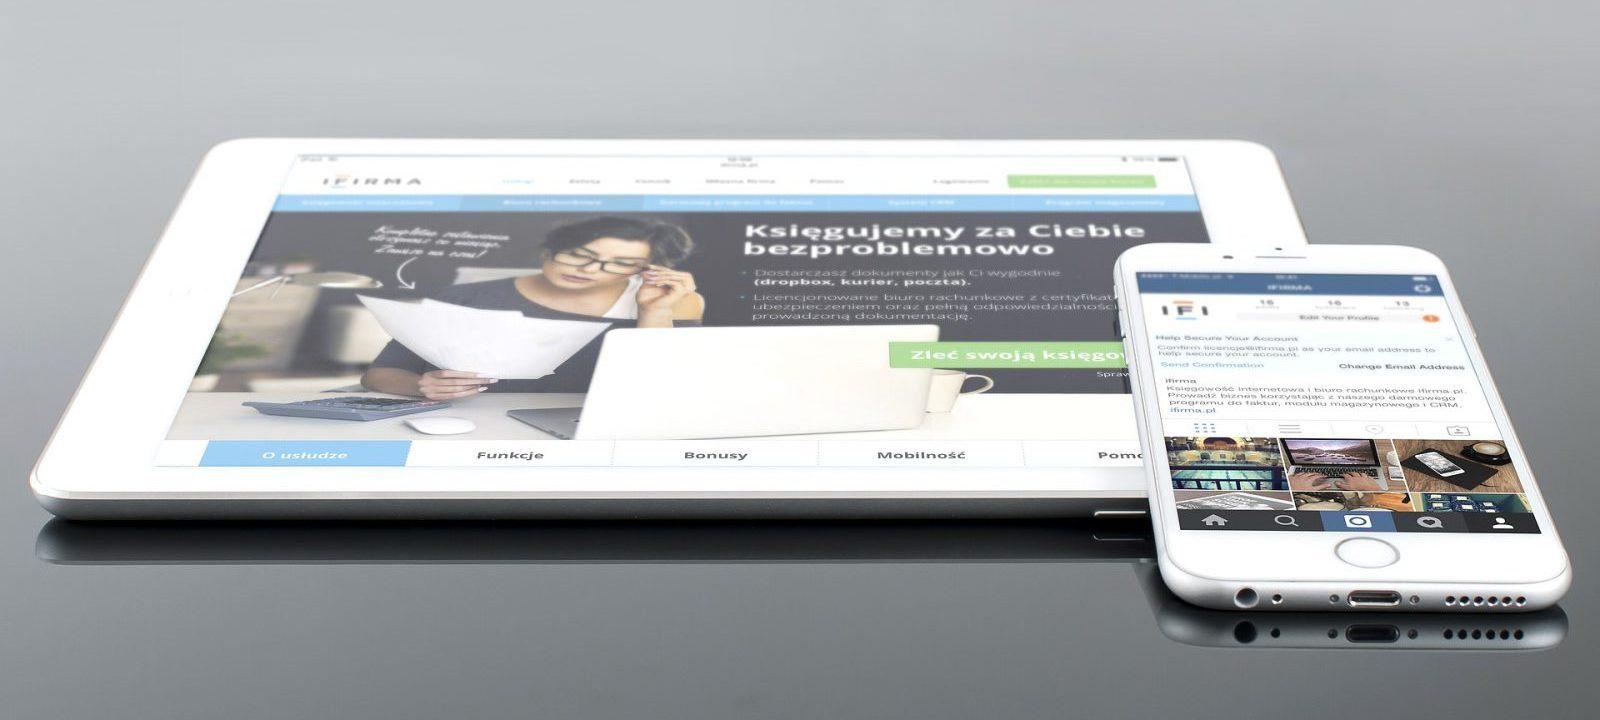 Opstart iPad en iPhone